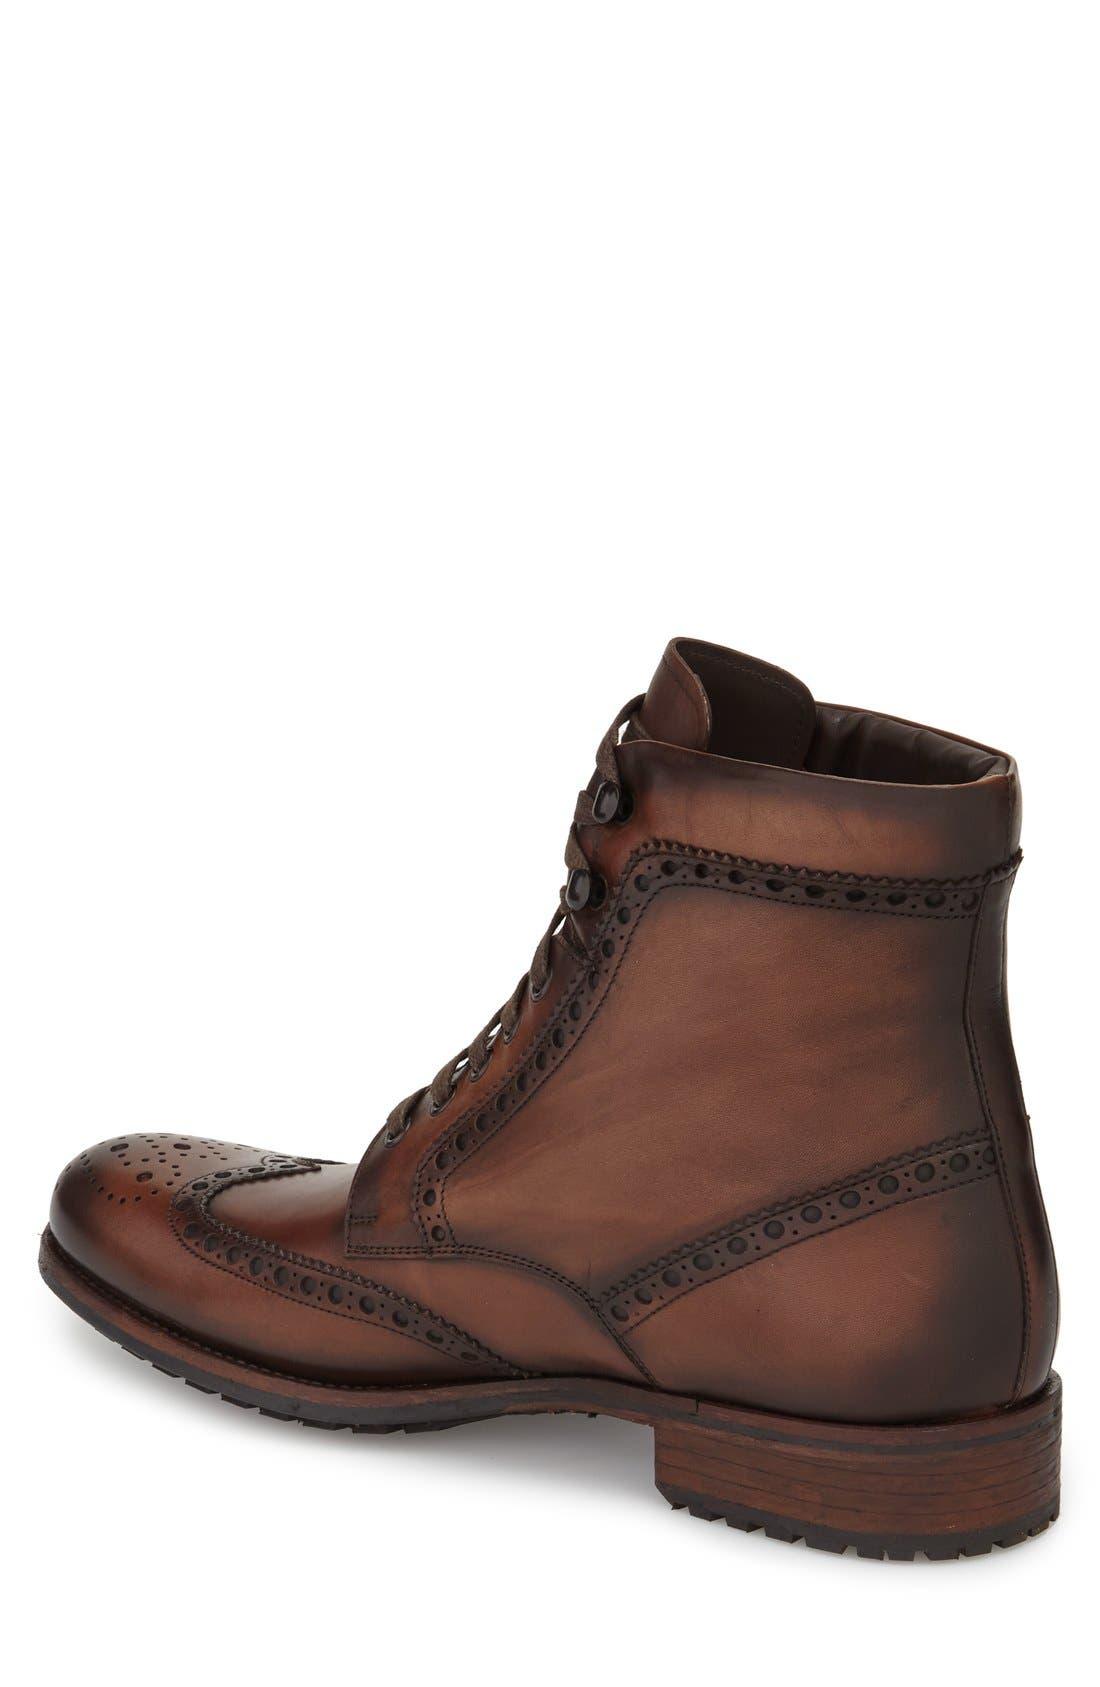 Alternate Image 2  - Magnanni Maddox Wingtip Boot (Men)